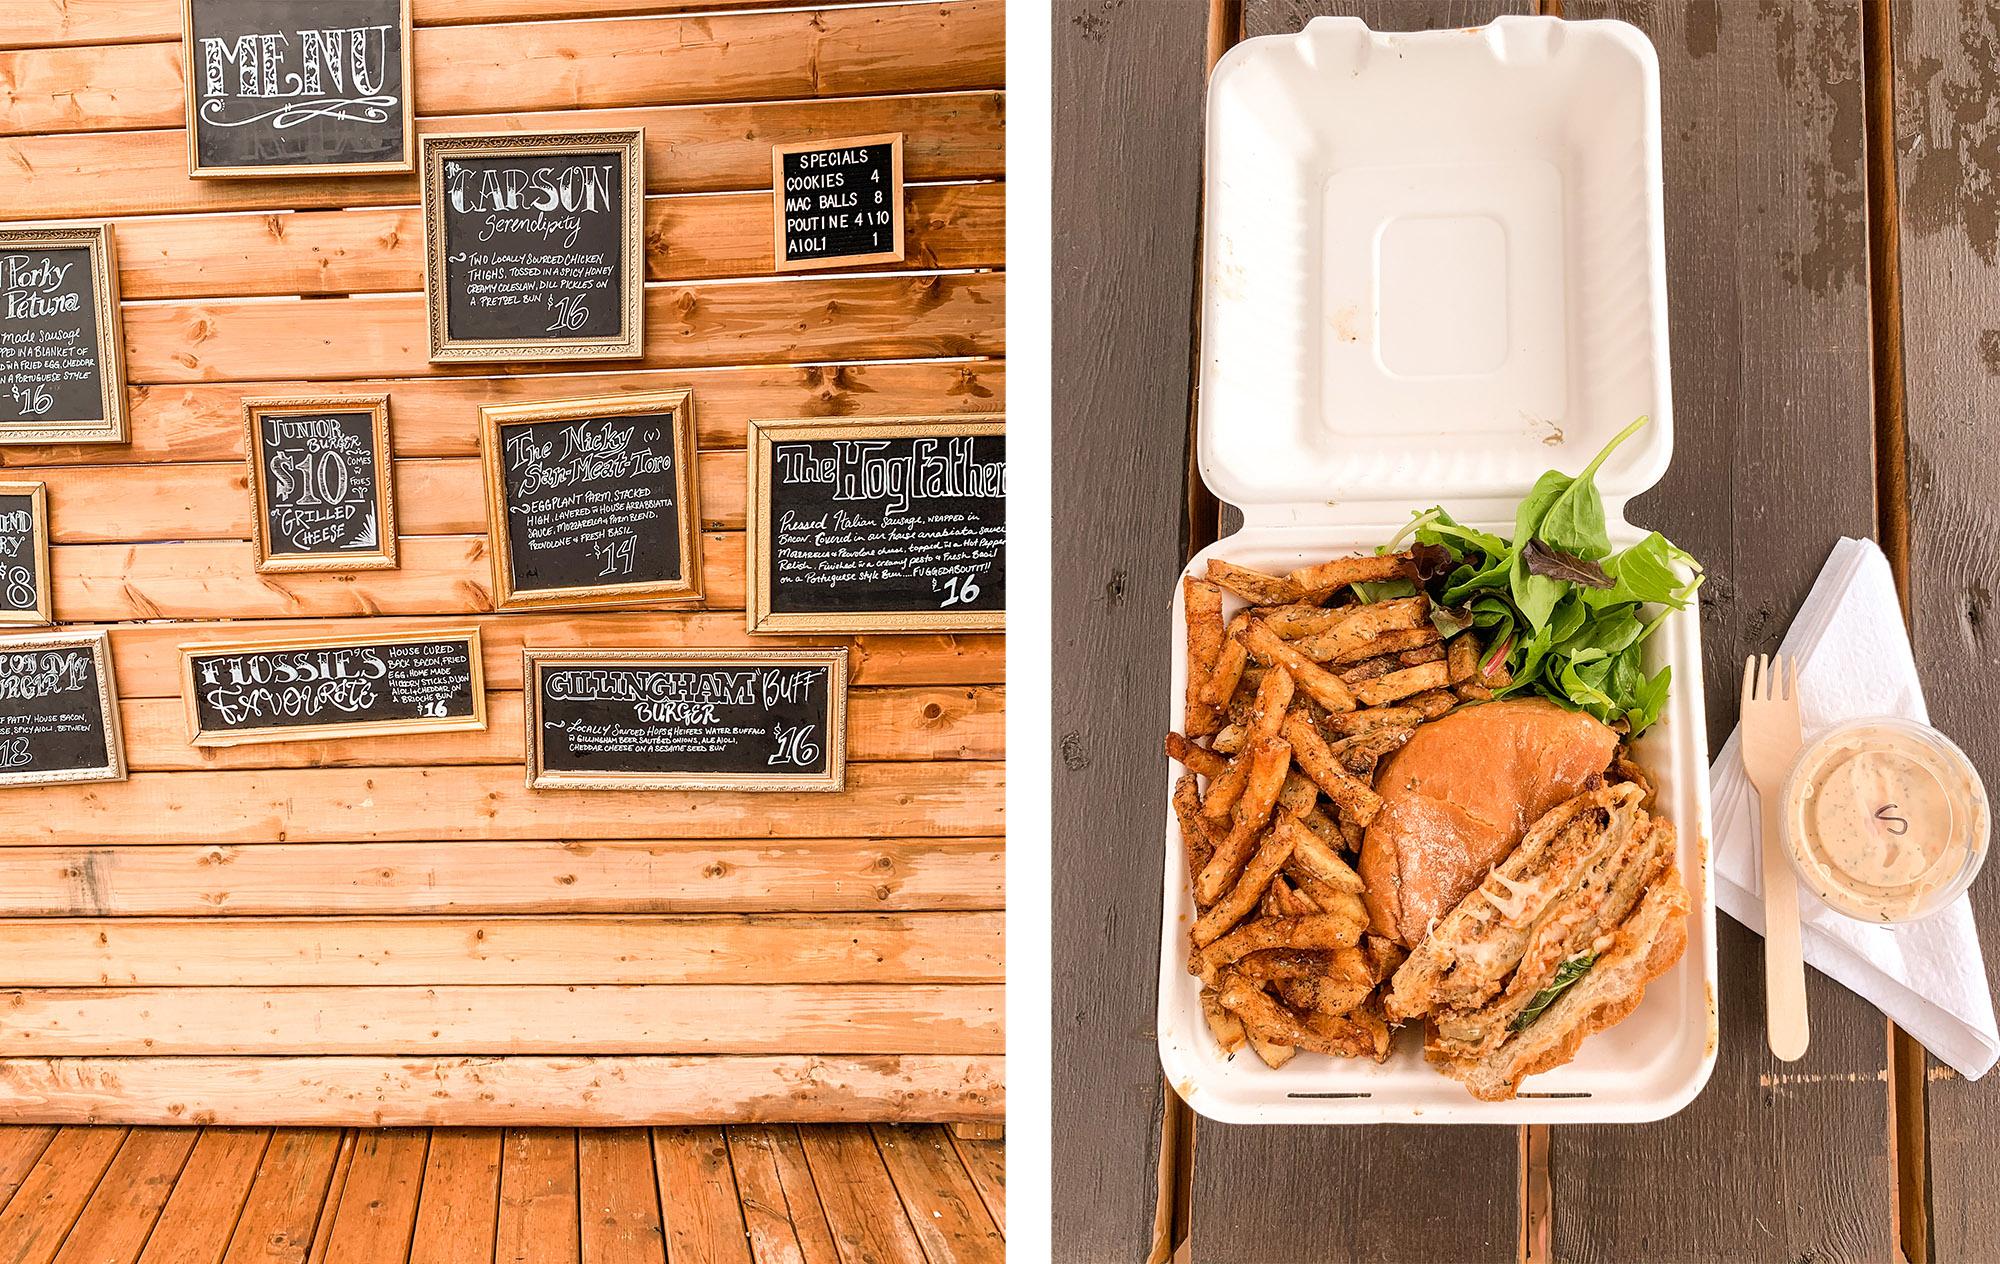 Flossie's Sandwich Parlour - Prince Edward County